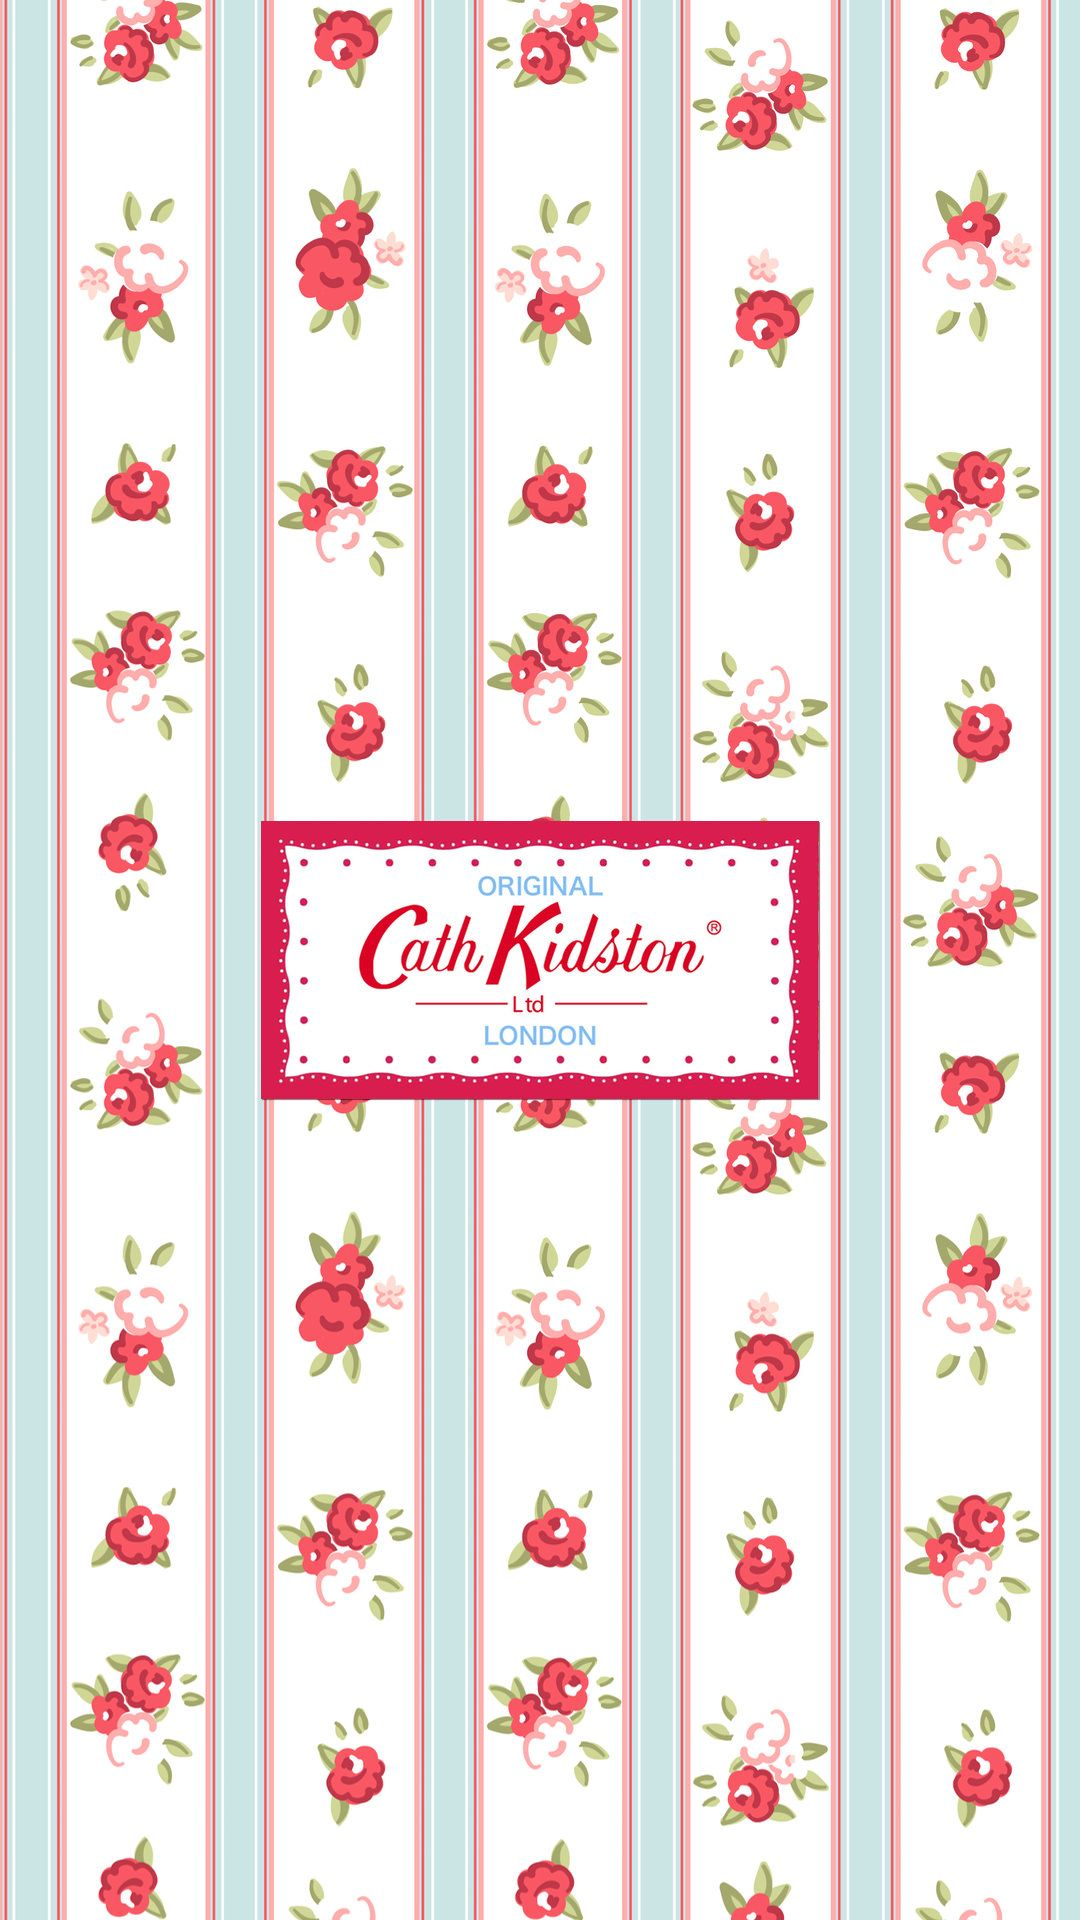 Chanelchanel Cath Kidston Wallpaper Pattern Wallpaper